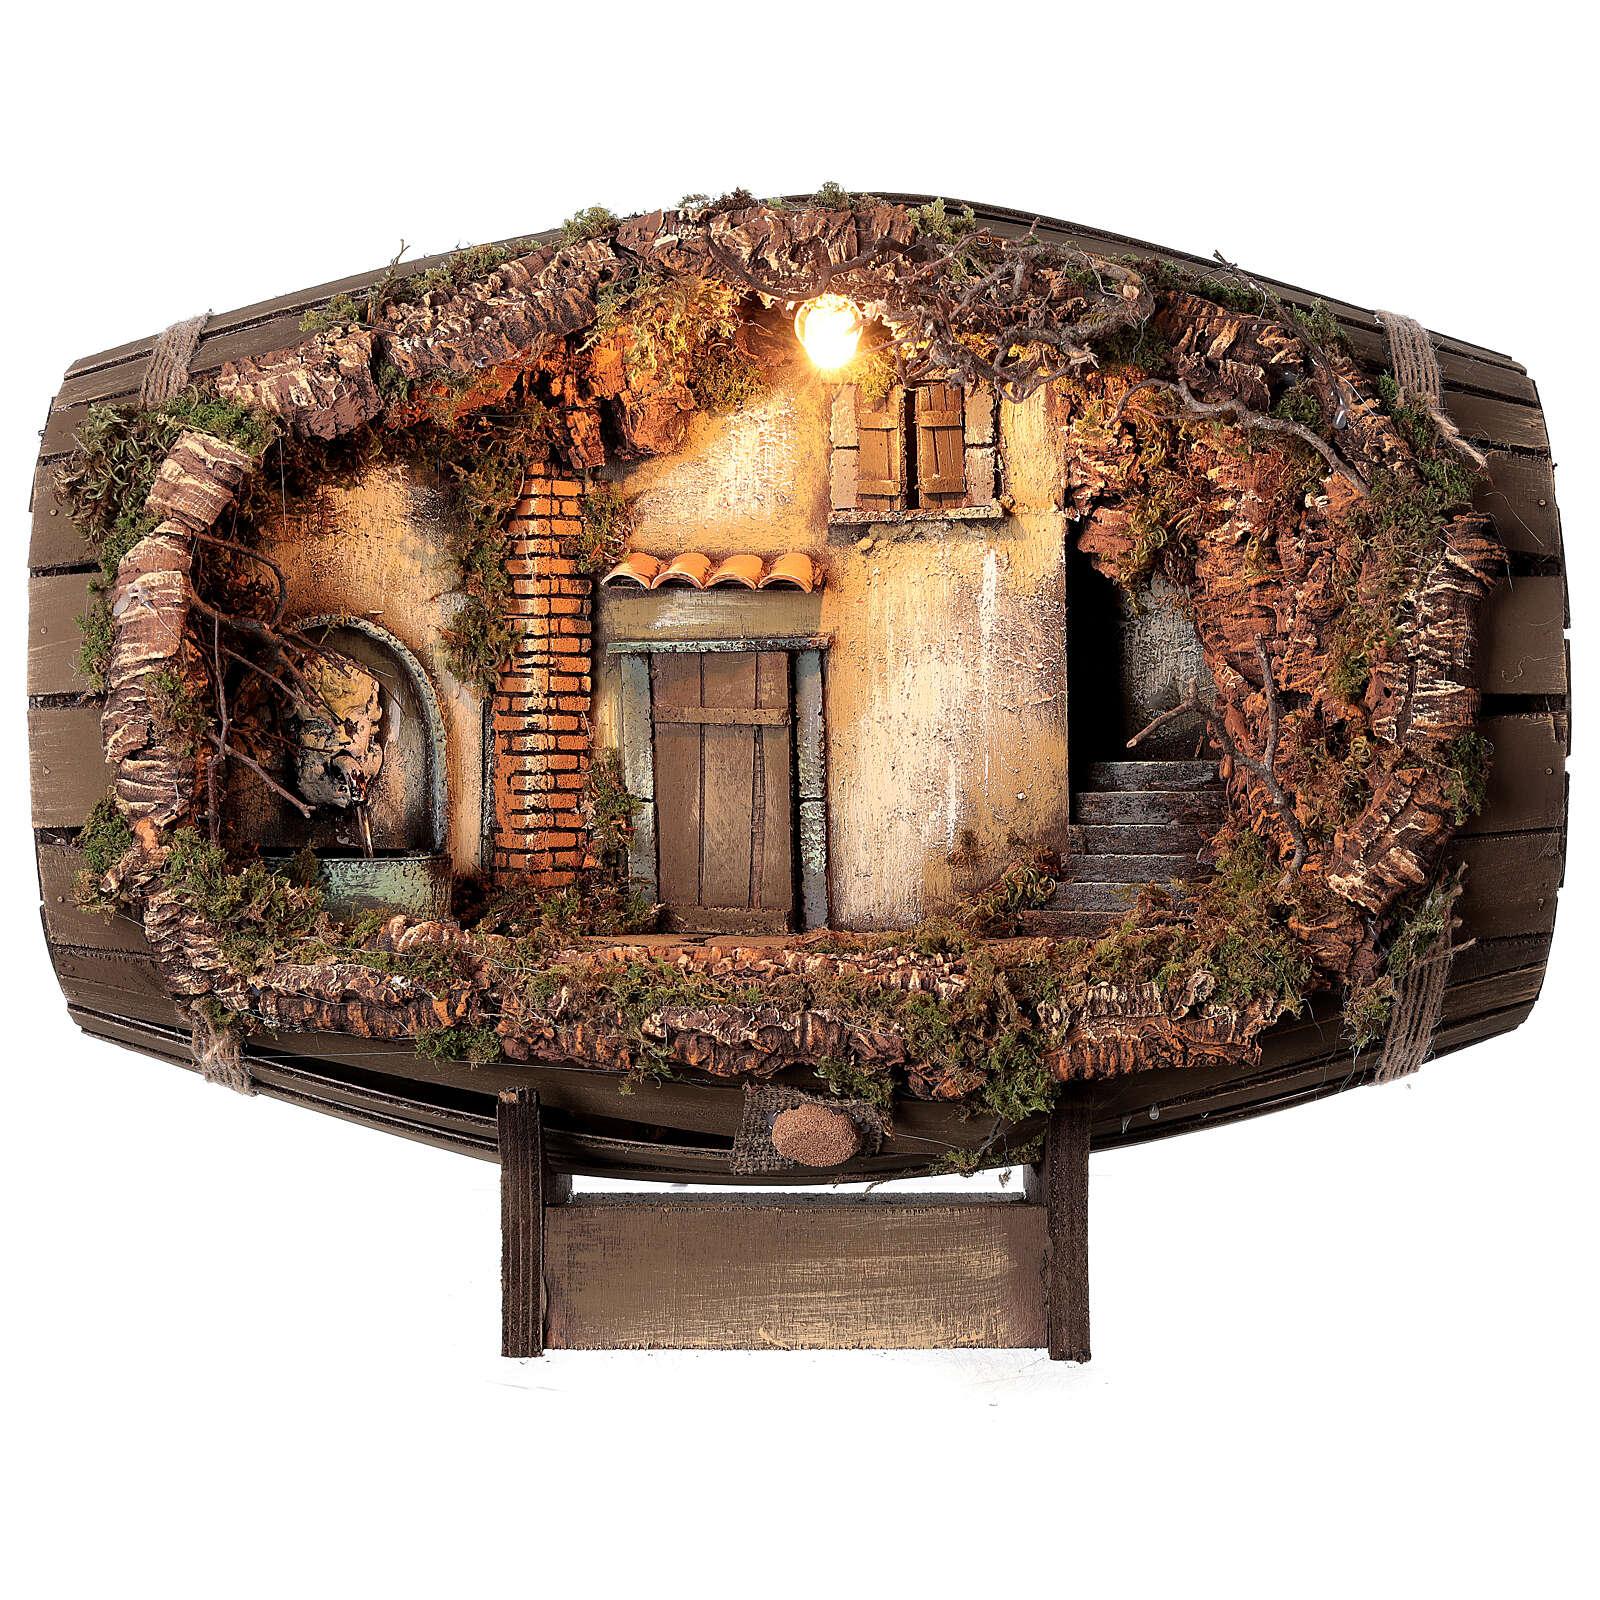 Fountain barrel working Neapolitan Nativity scene 10 cm 4